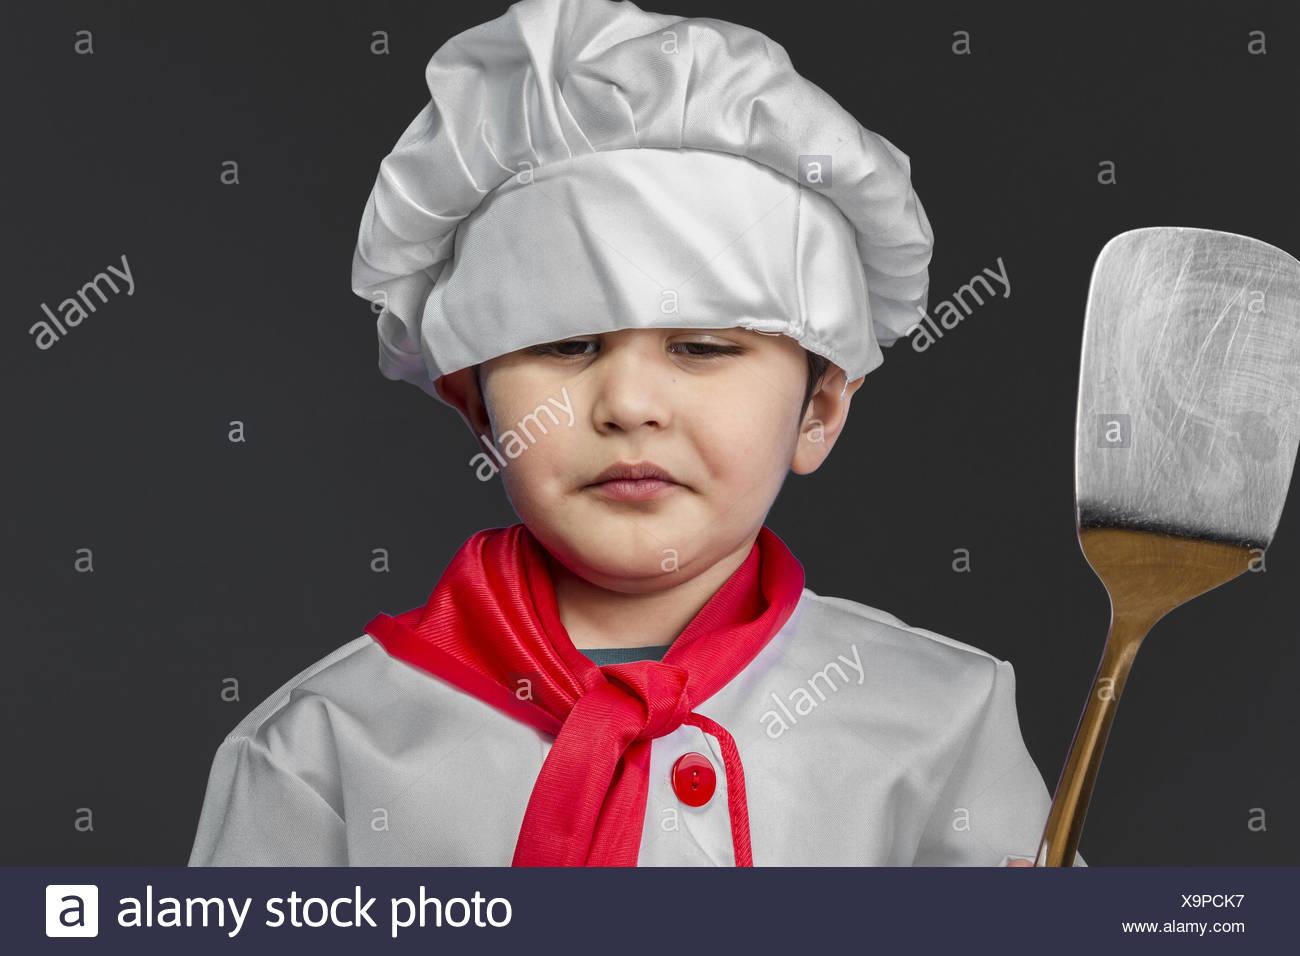 Kitchen, little boy preparing healthy food on kitchen over grey background, cook hat - Stock Image